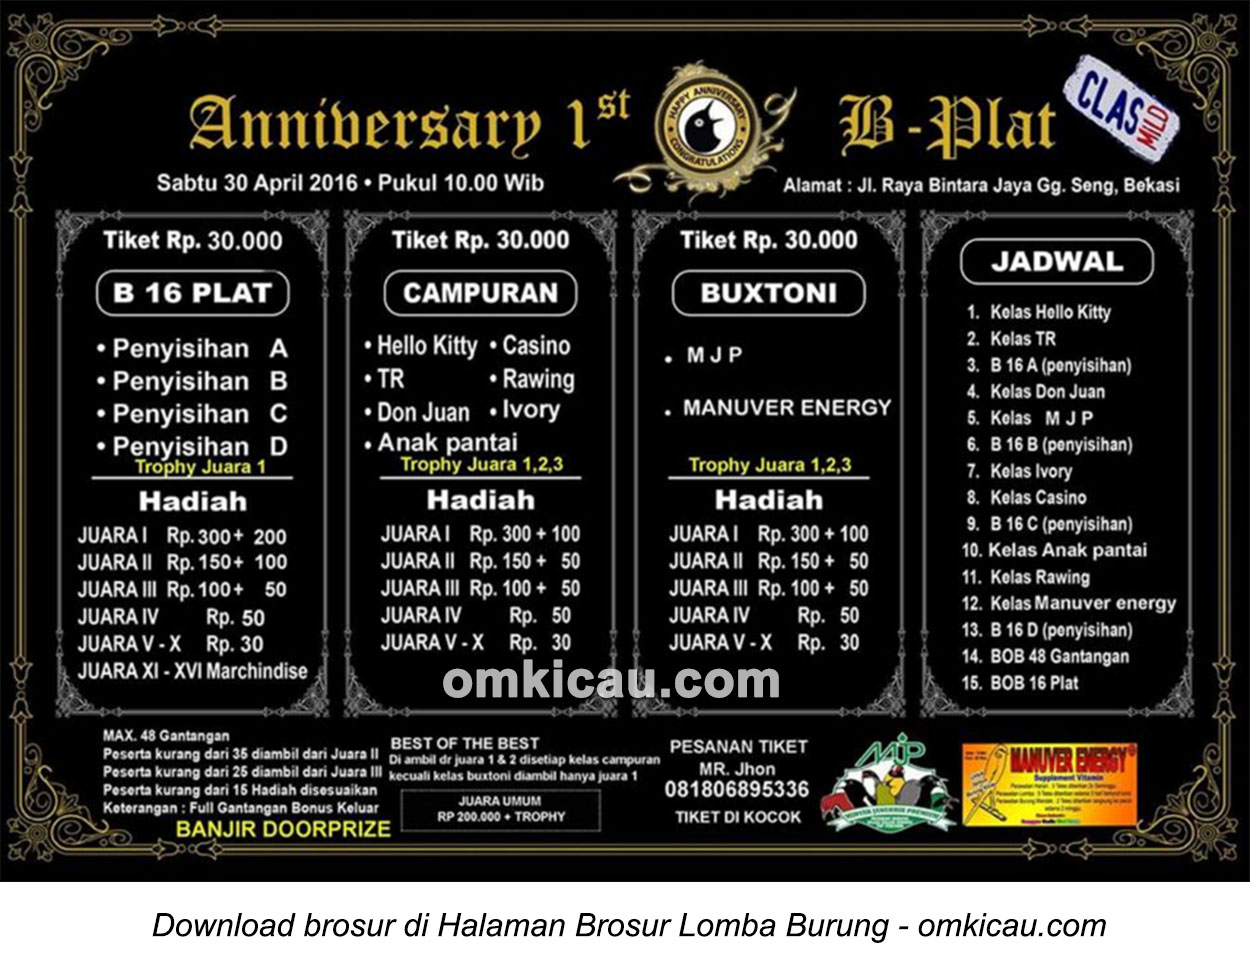 Brosur Kontes Pleci 1st Anniversary B-Plat, Bekasi, 30 April 2016